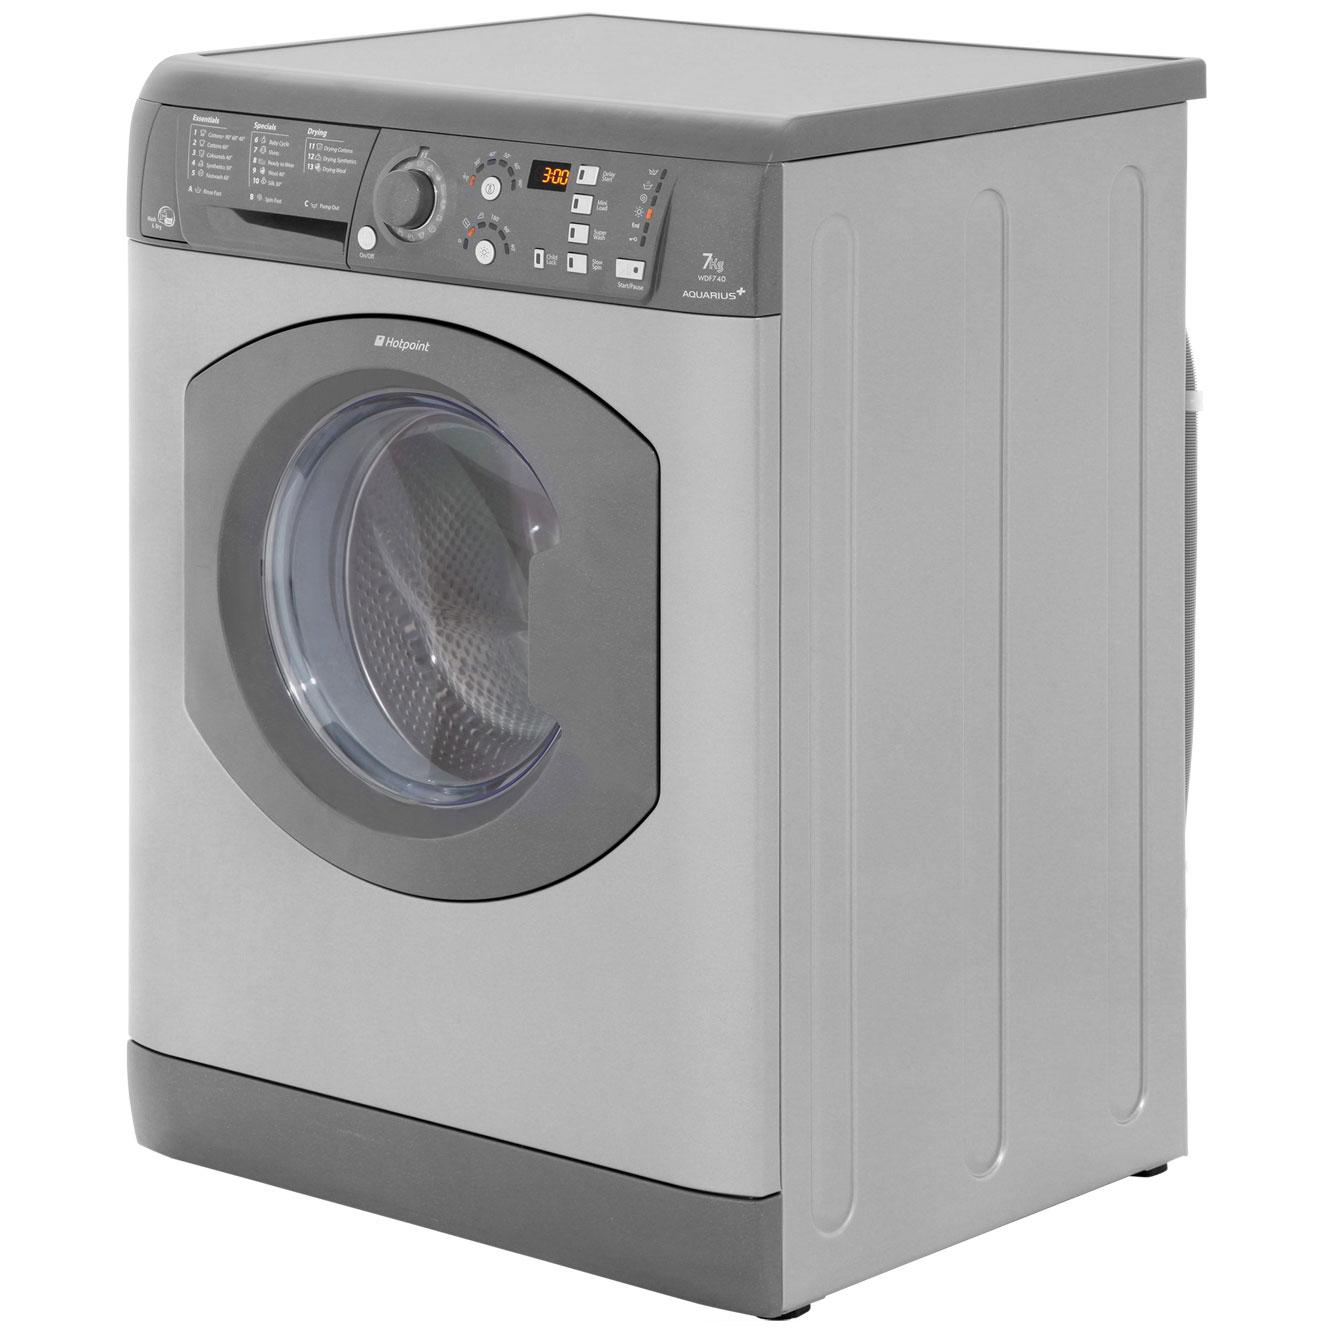 hotpoint aquarius wdf740p 7kg 5kg washer dryer 1400 rpm hotpoint aquarius wdf740p 7kg 5kg washer dryer 1400 rpm polar white